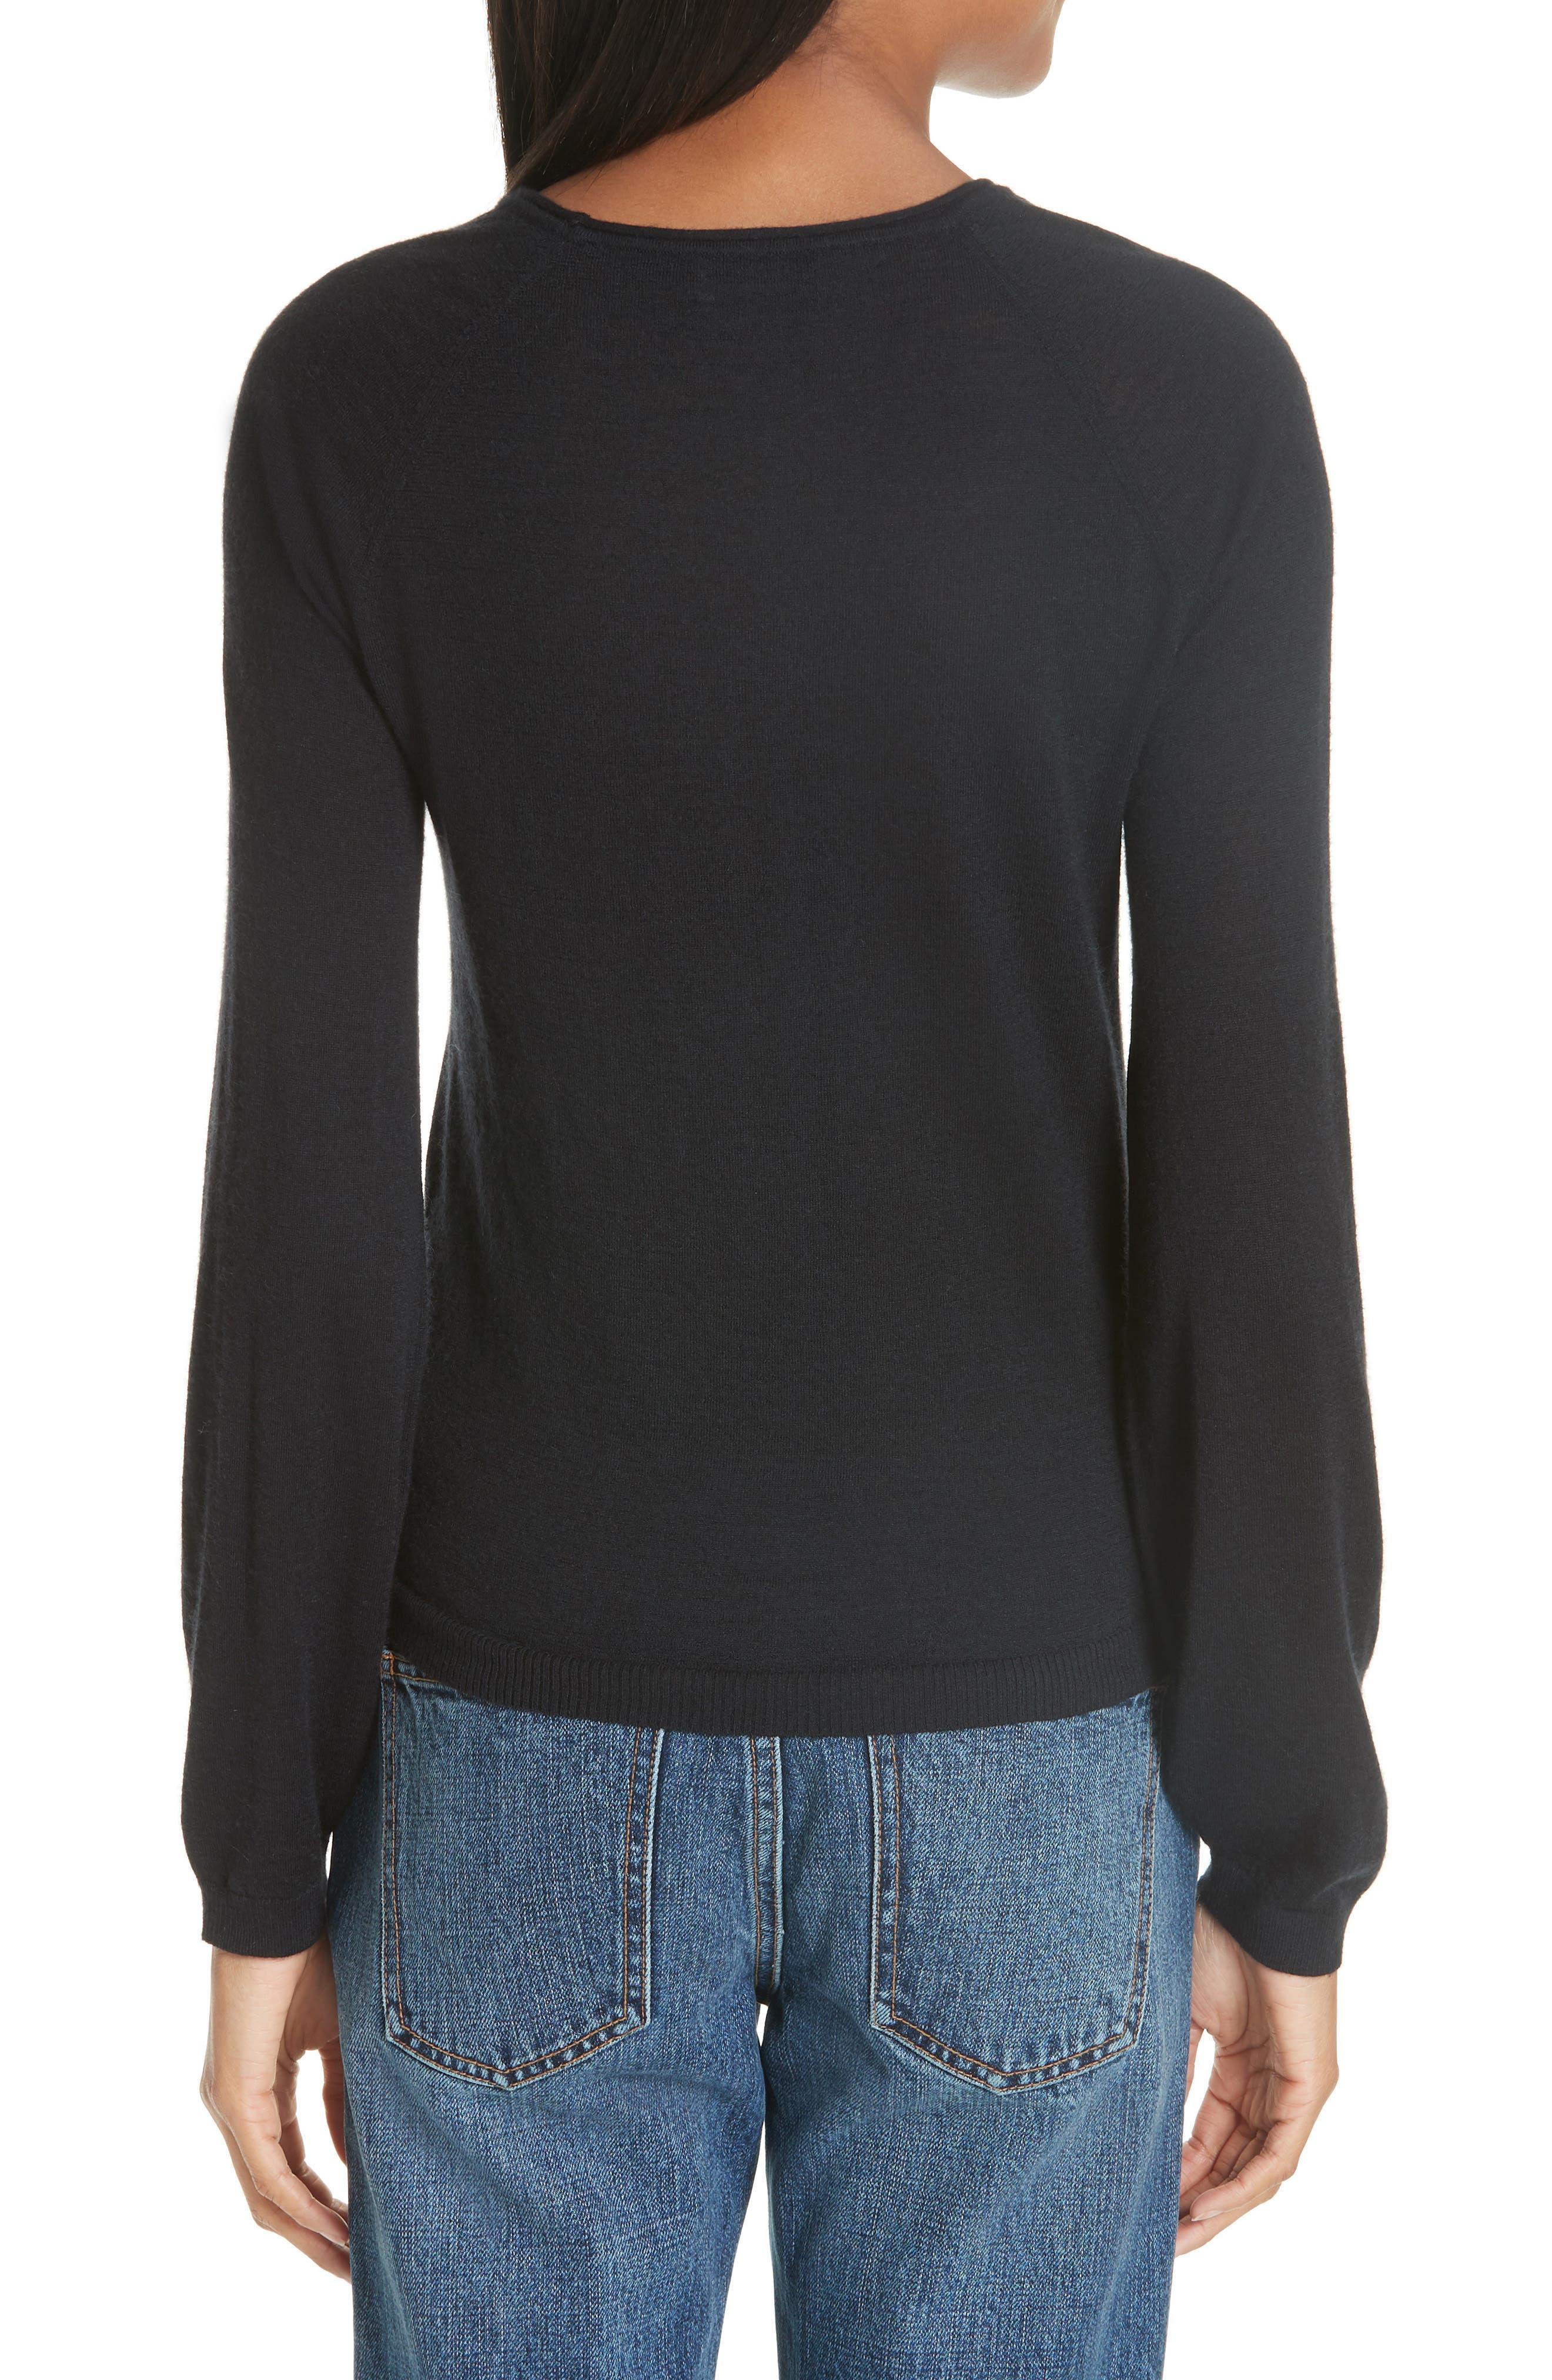 CO, Essentials Cashmere Sweater, Alternate thumbnail 2, color, BLACK